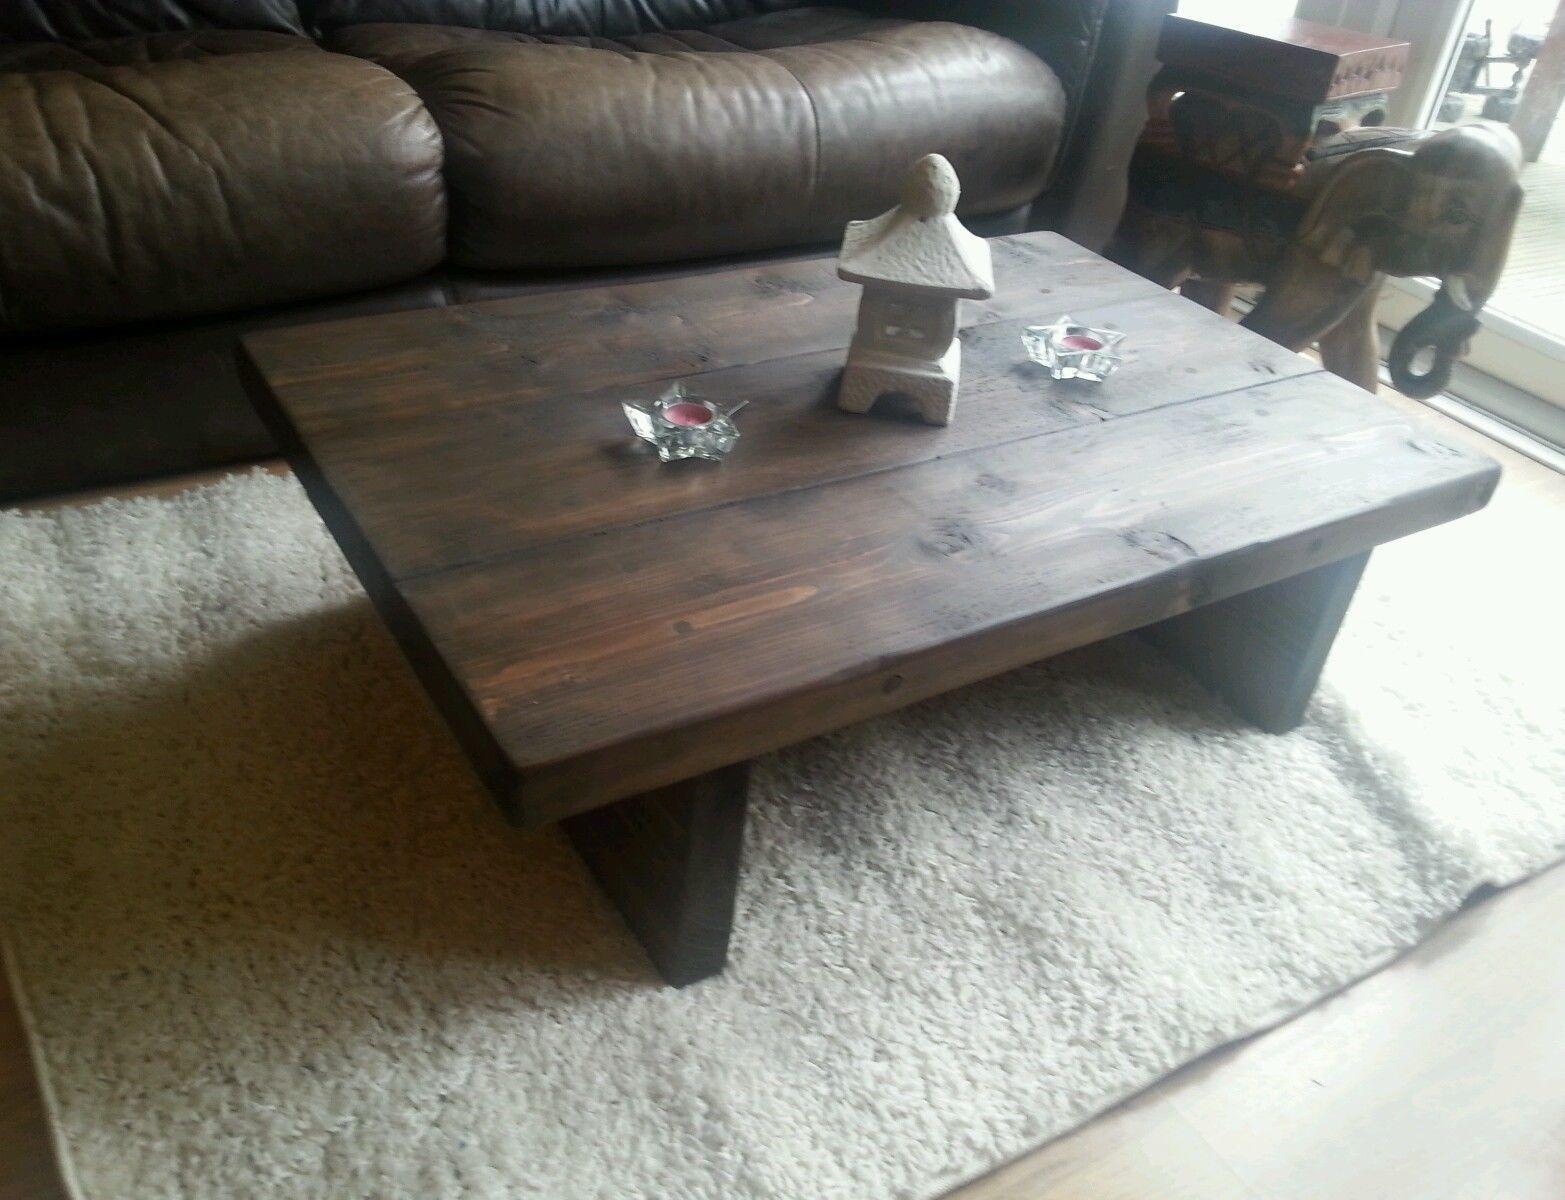 Chunky Rustic Reclaimed Style Coffee Table Handmade Solid Wood Dark Oak Stain Https T Co Atpjivi9tm Https Oak Stain Coffee Table Reclaimed Wood Sideboard [ 1200 x 1565 Pixel ]